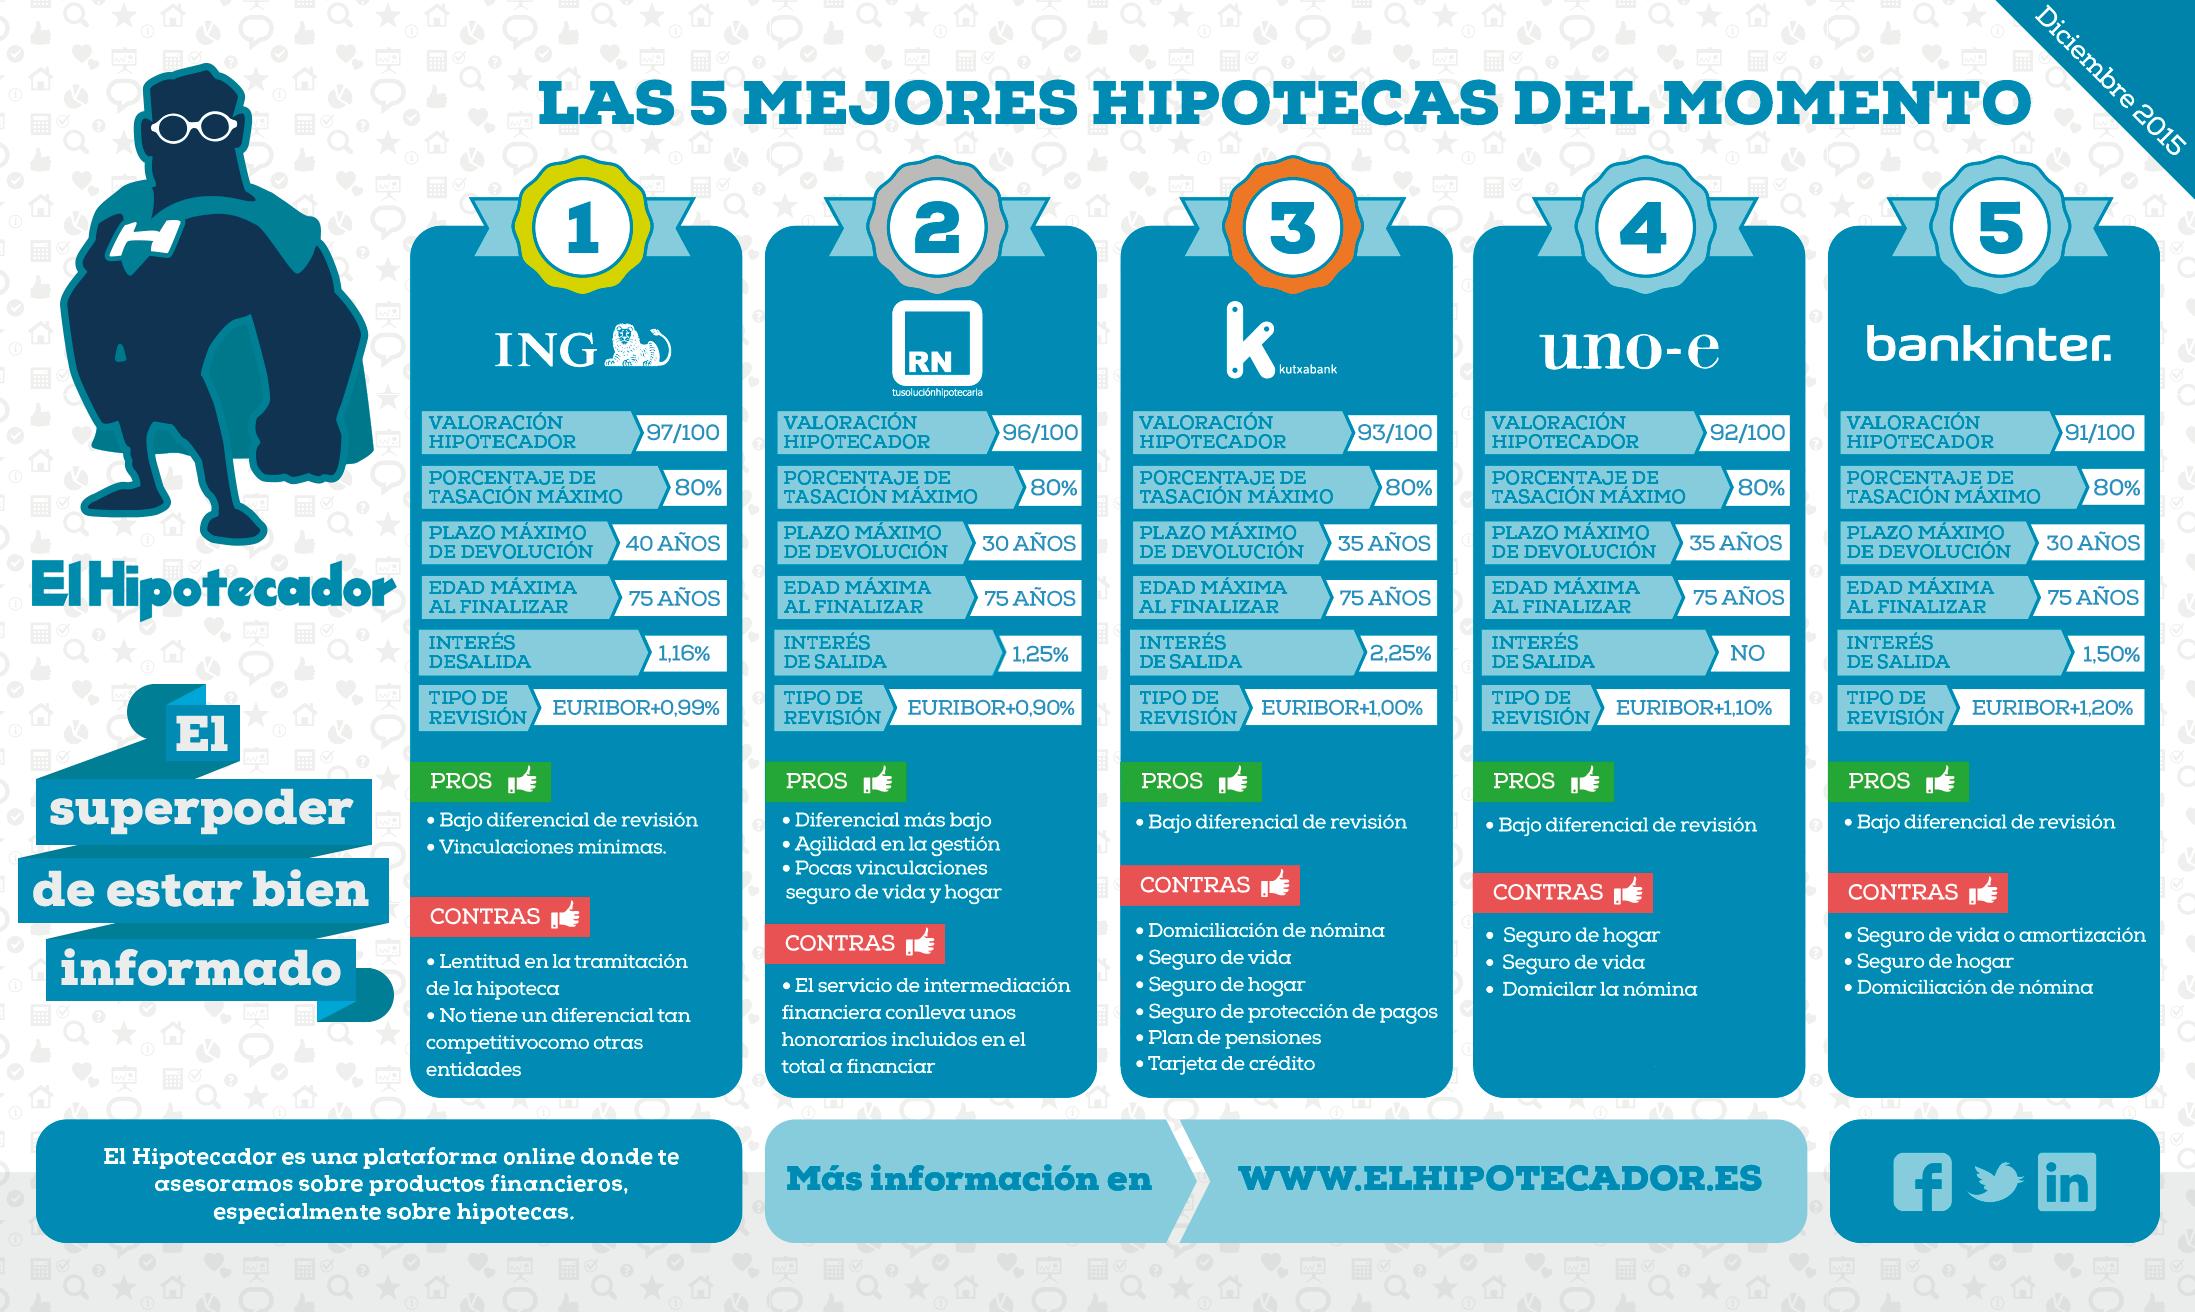 Infografia-Mejores-Hipotecas-Variables-(El-Hipotecador)---diciembre-2015-1